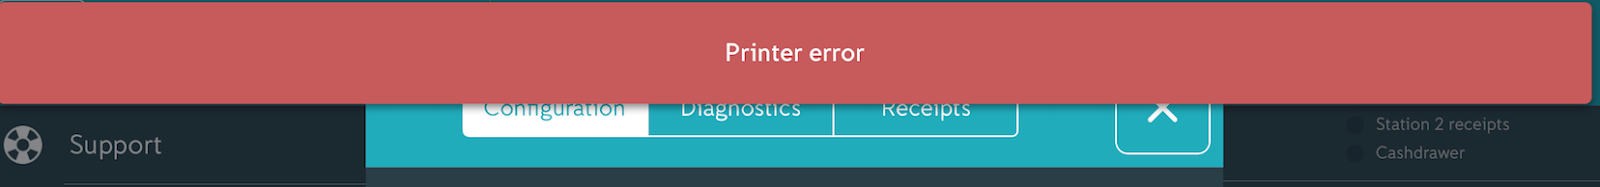 iZettle | Help - Printers